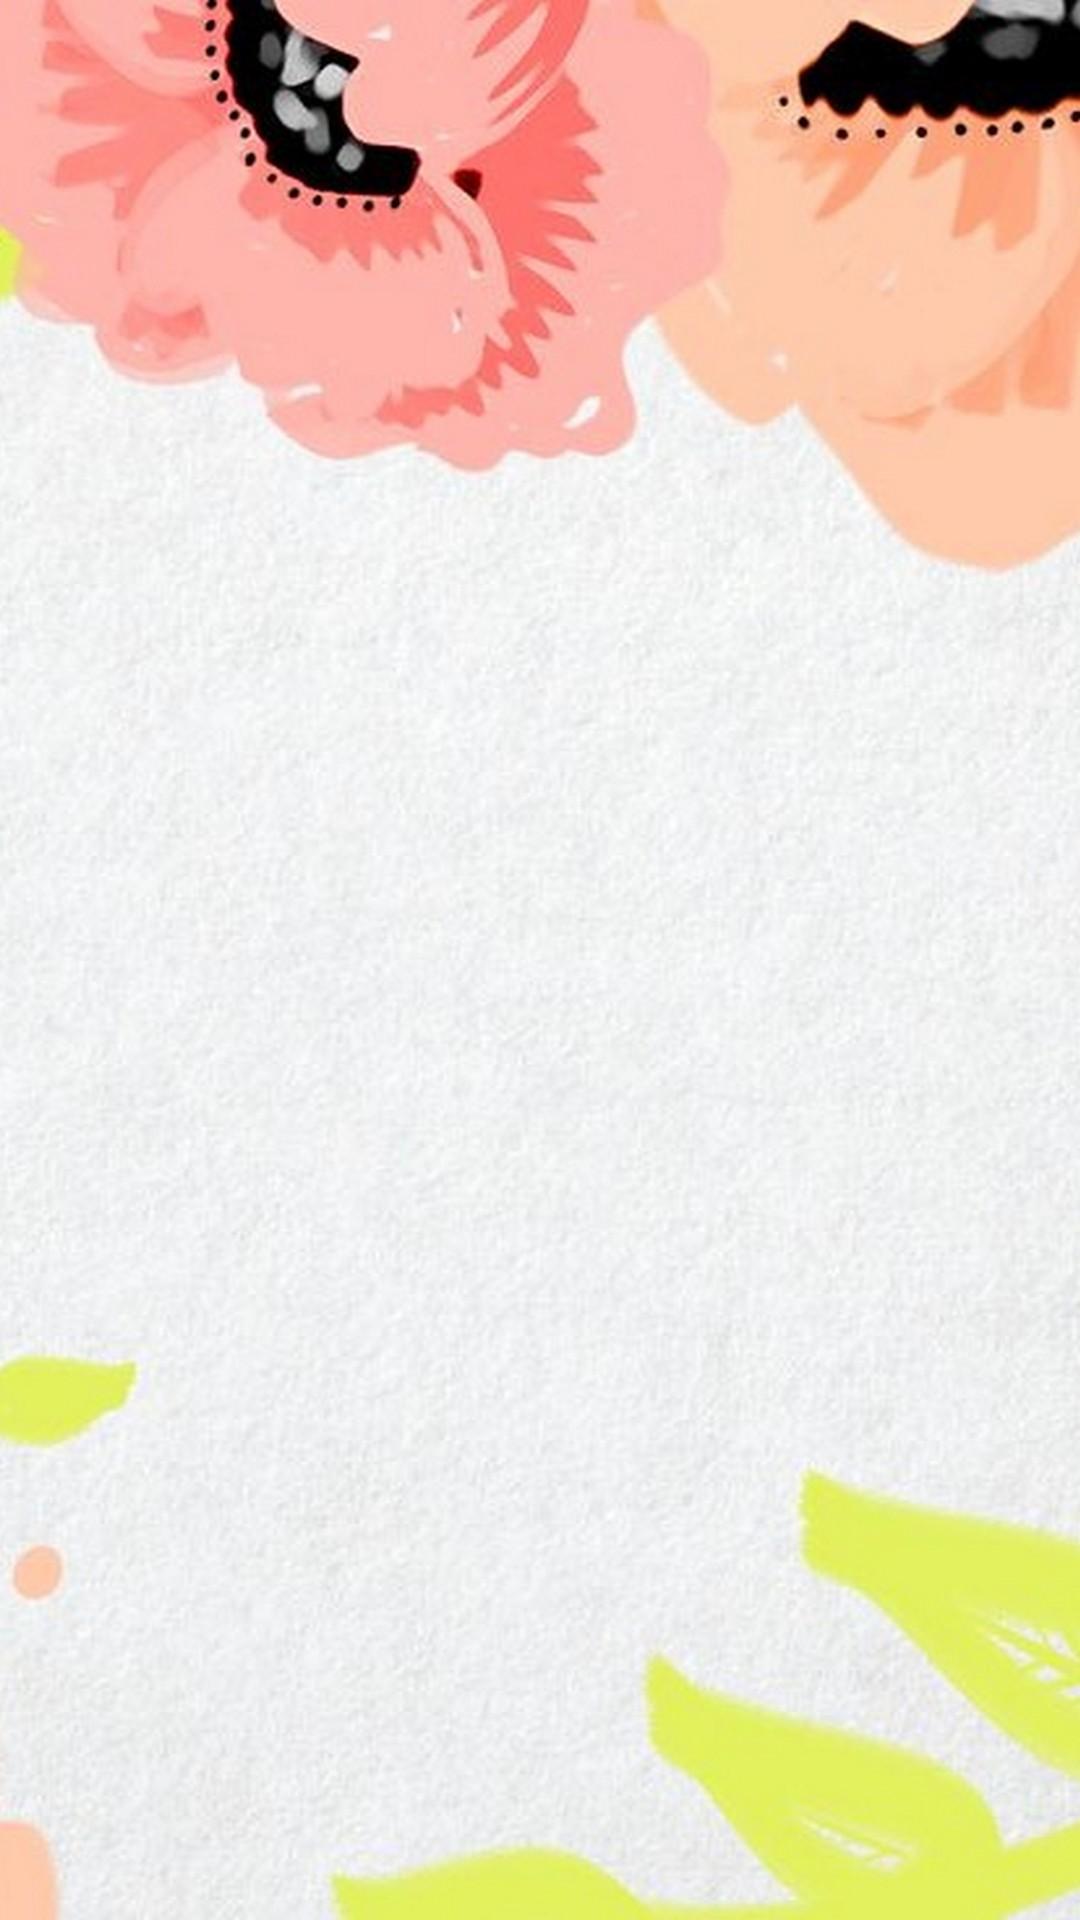 Cute Iphone 7 Wallpaper Hd 2020 Phone Wallpaper Hd